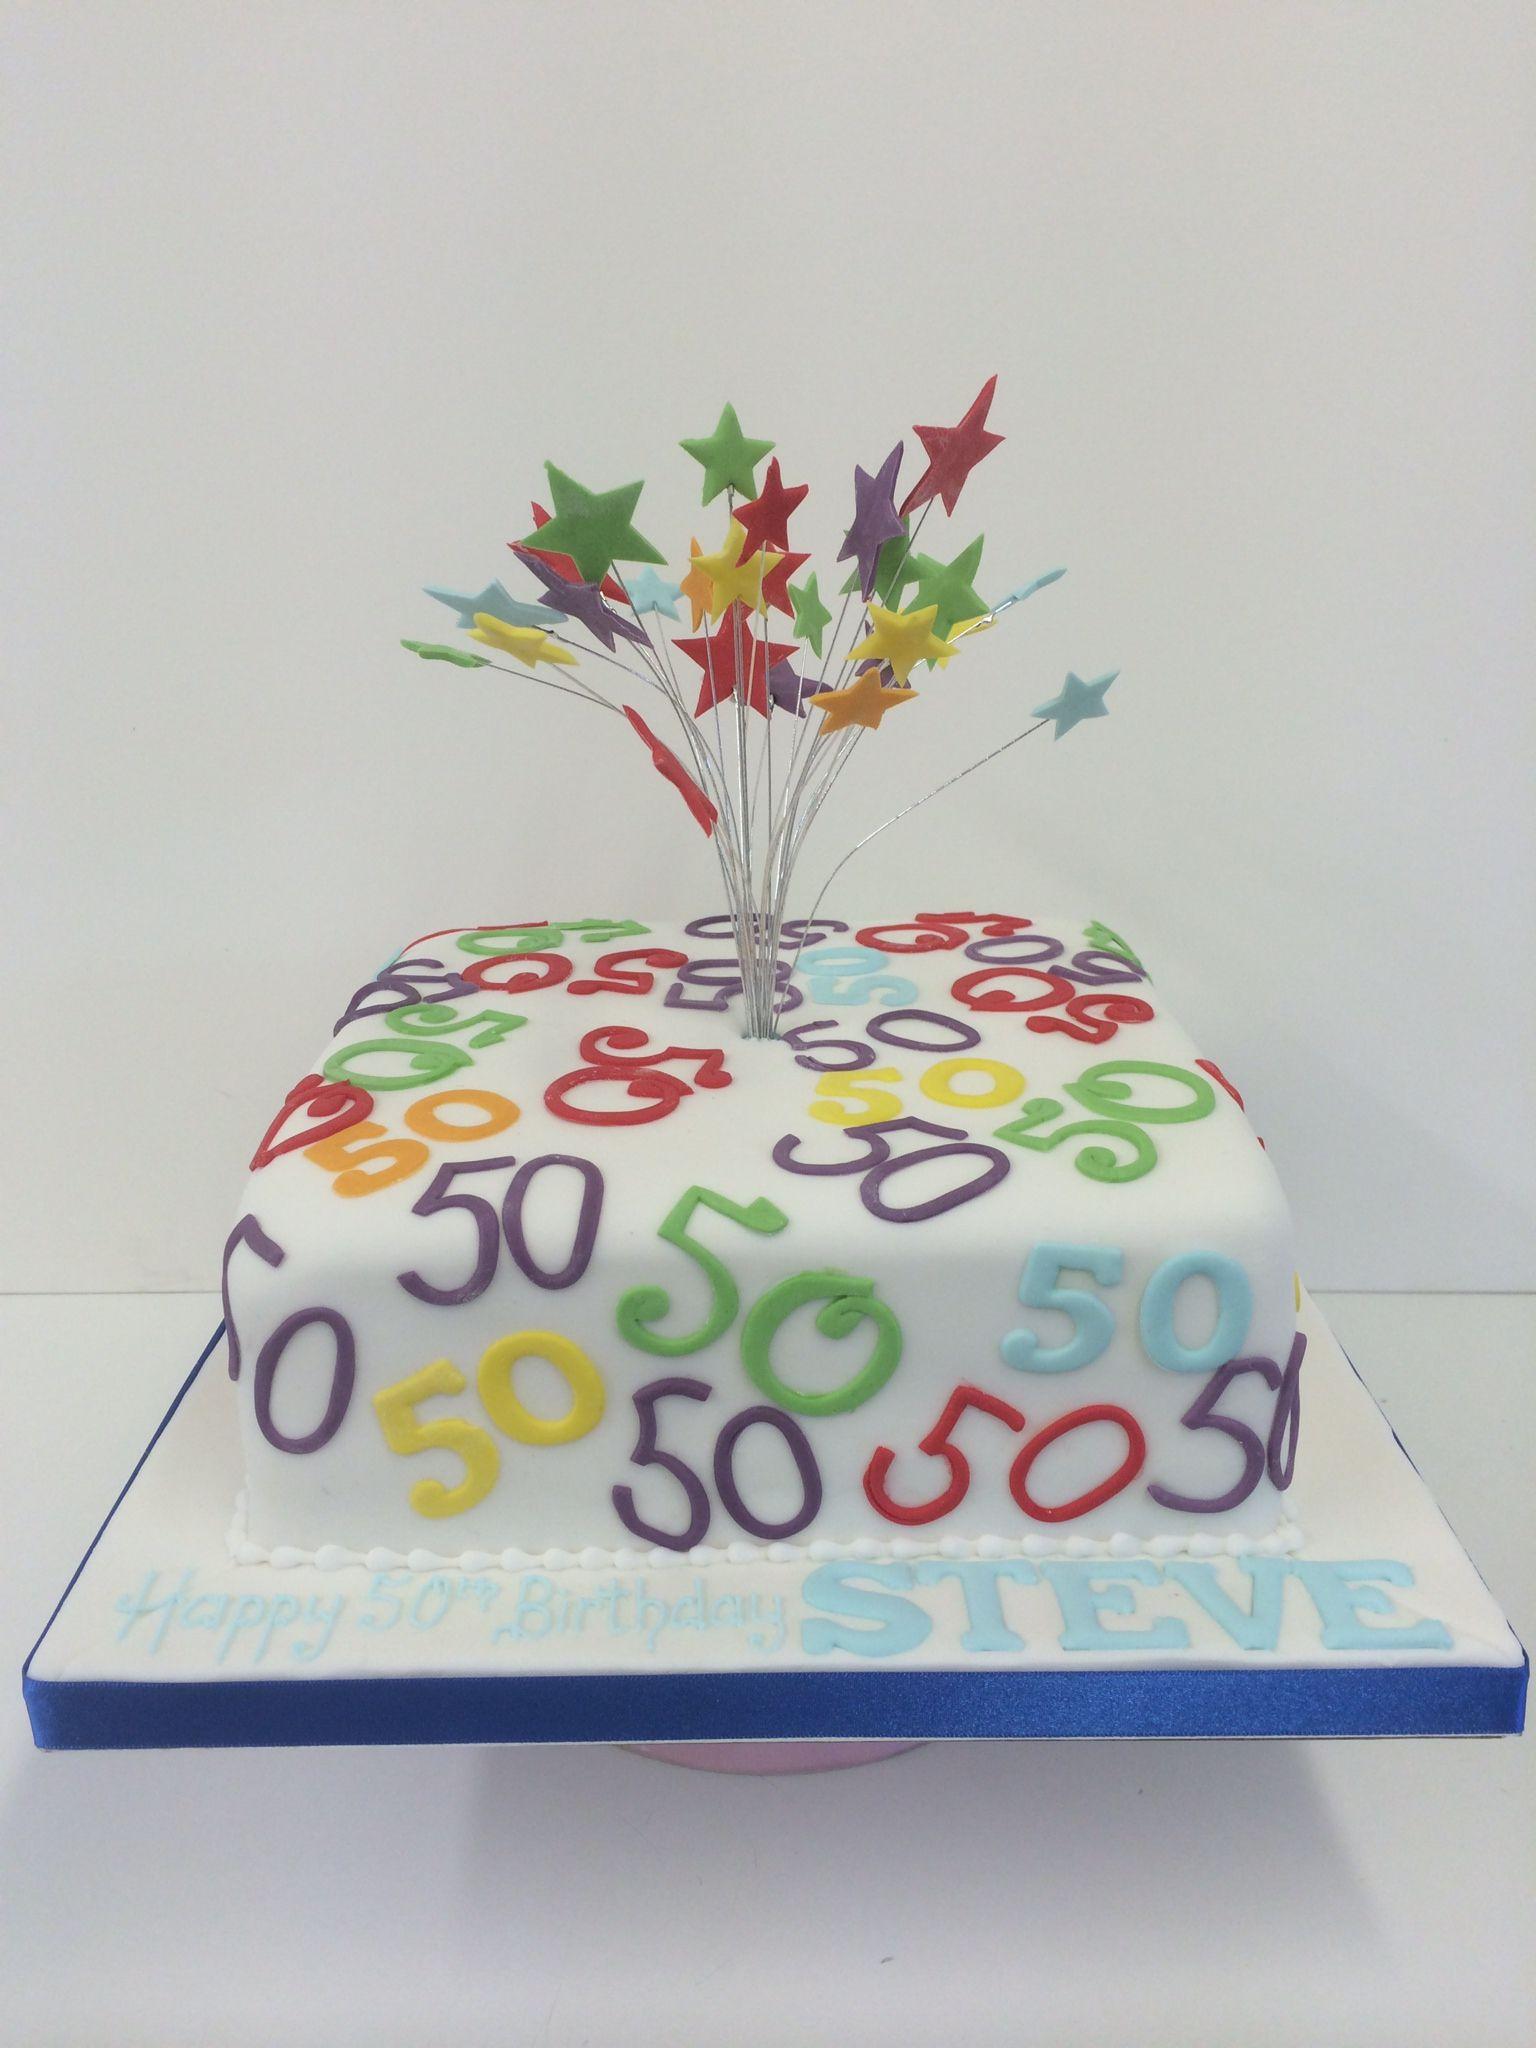 50th Birthday Cakes Women For Celebrations Cake Ideas